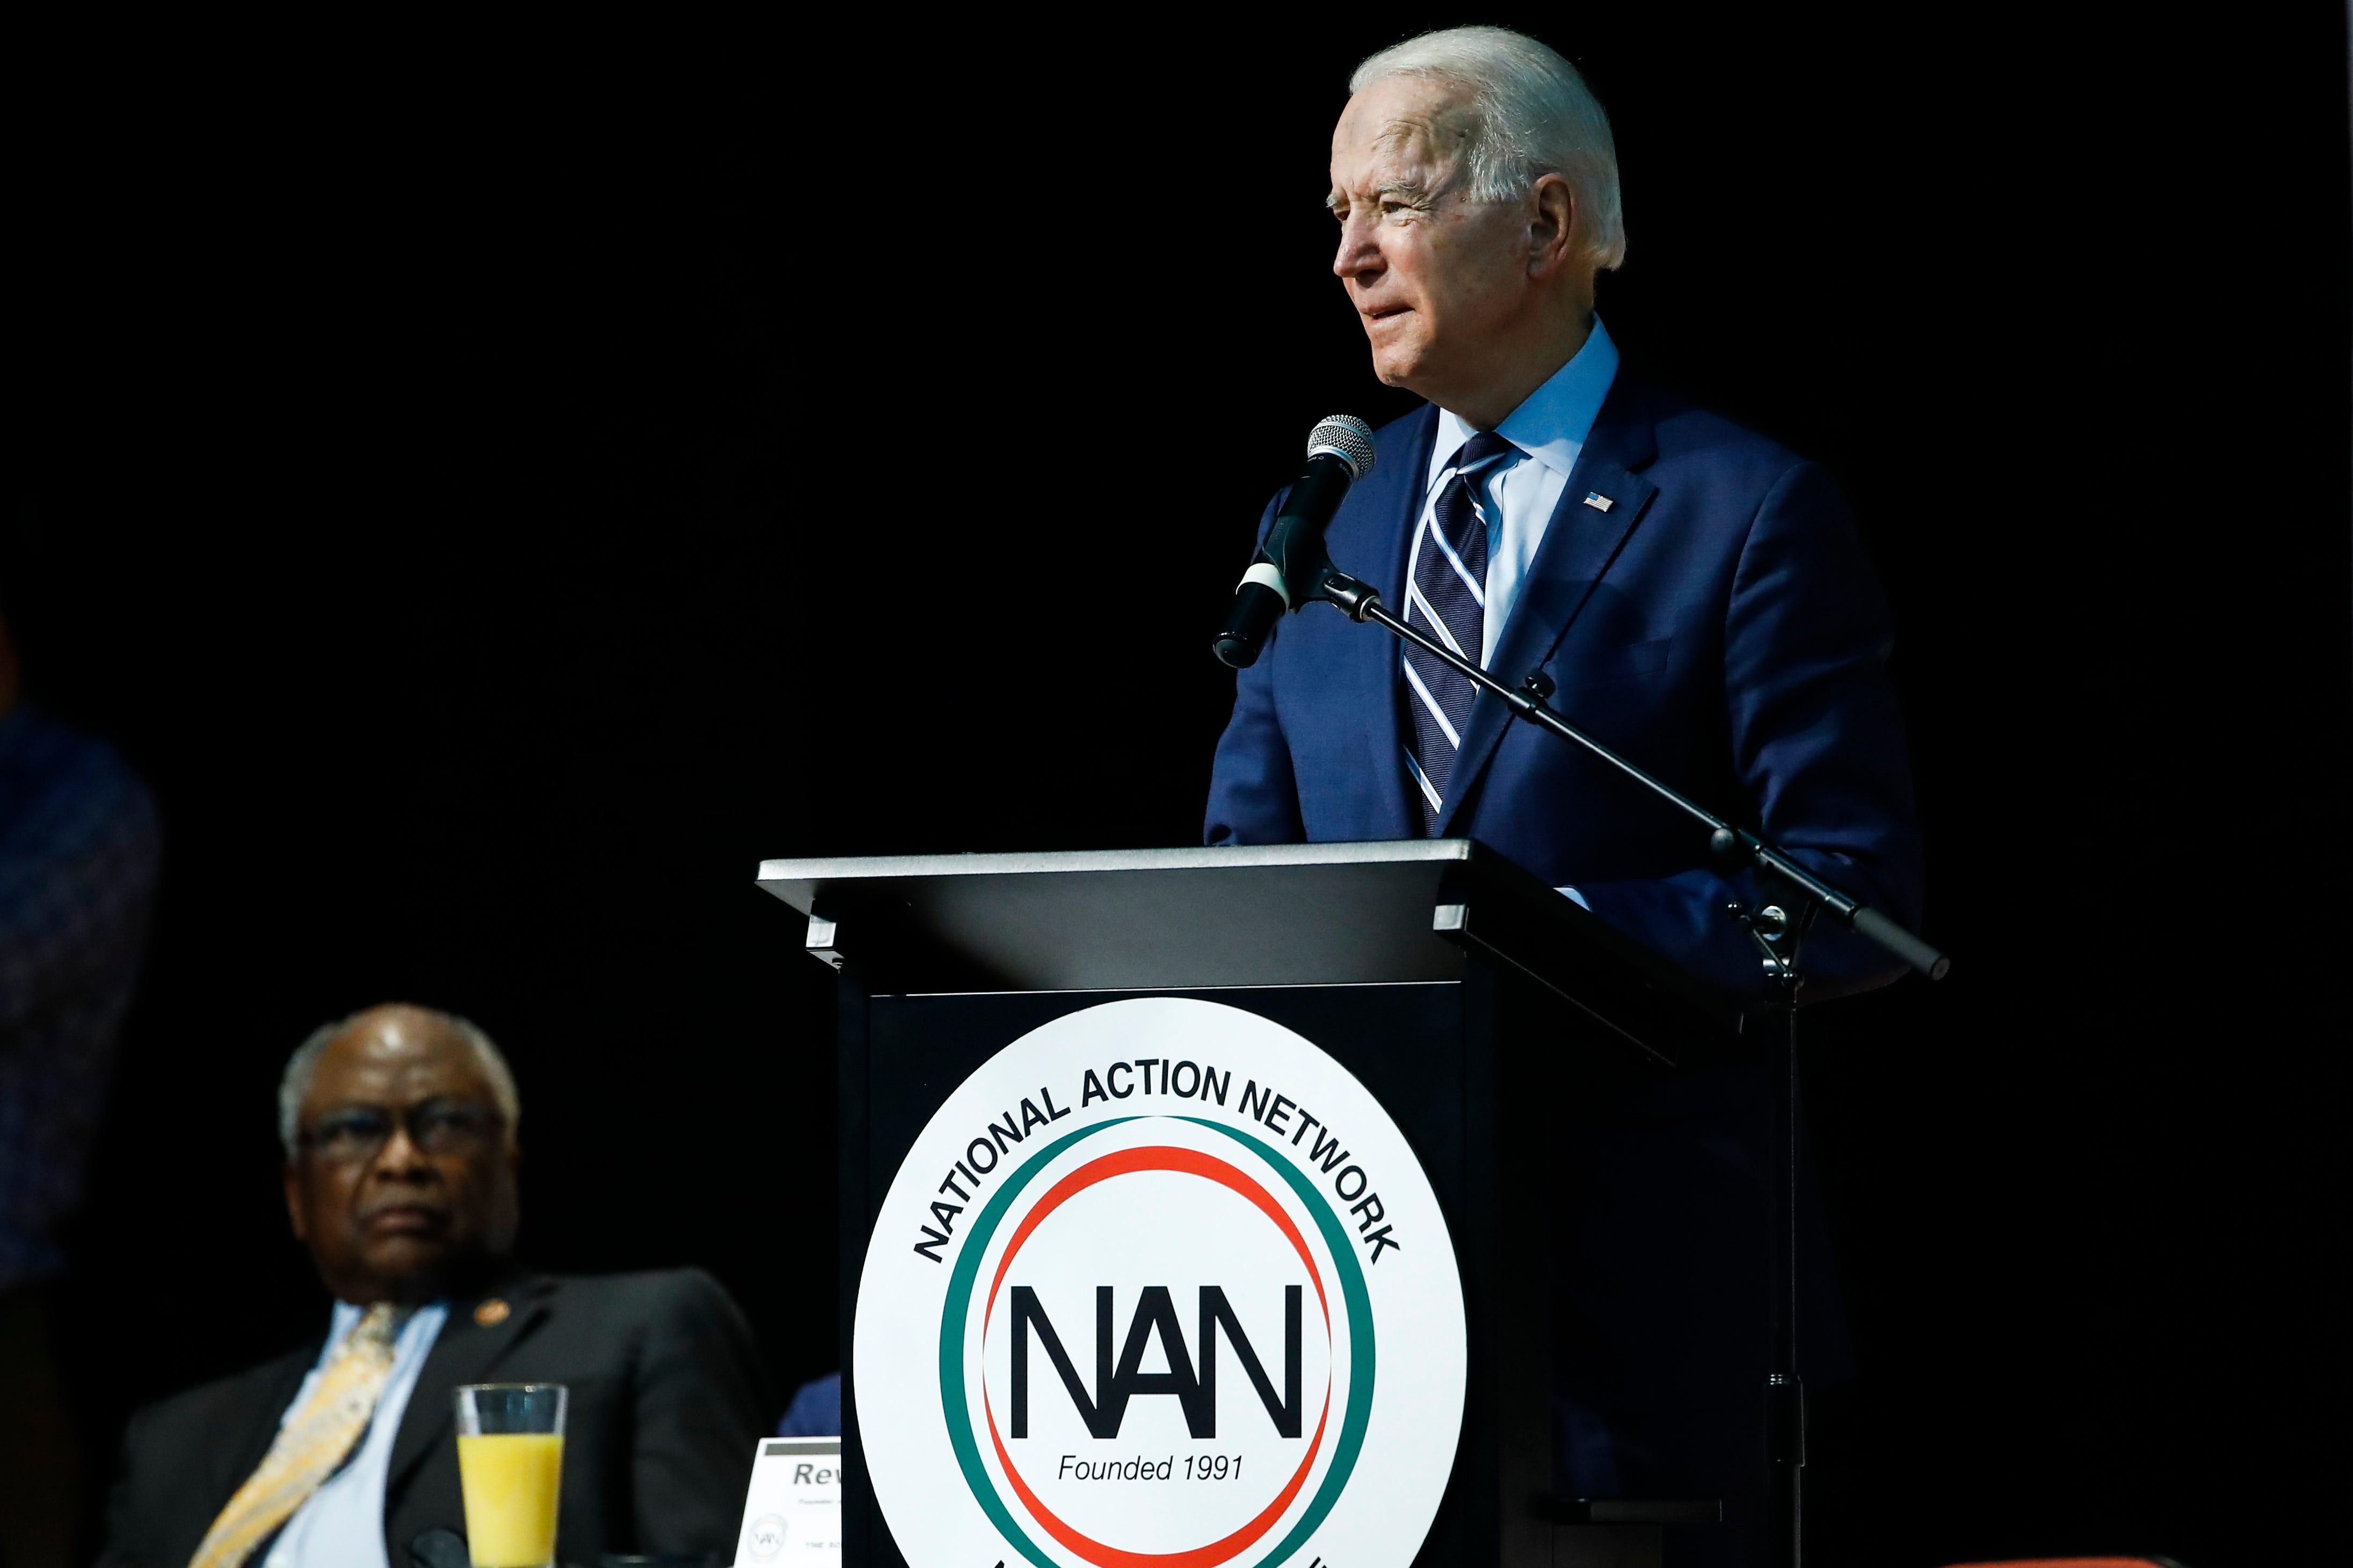 Joe Biden has big lead in South Carolina primary, per Clemson University's Palmetto Poll